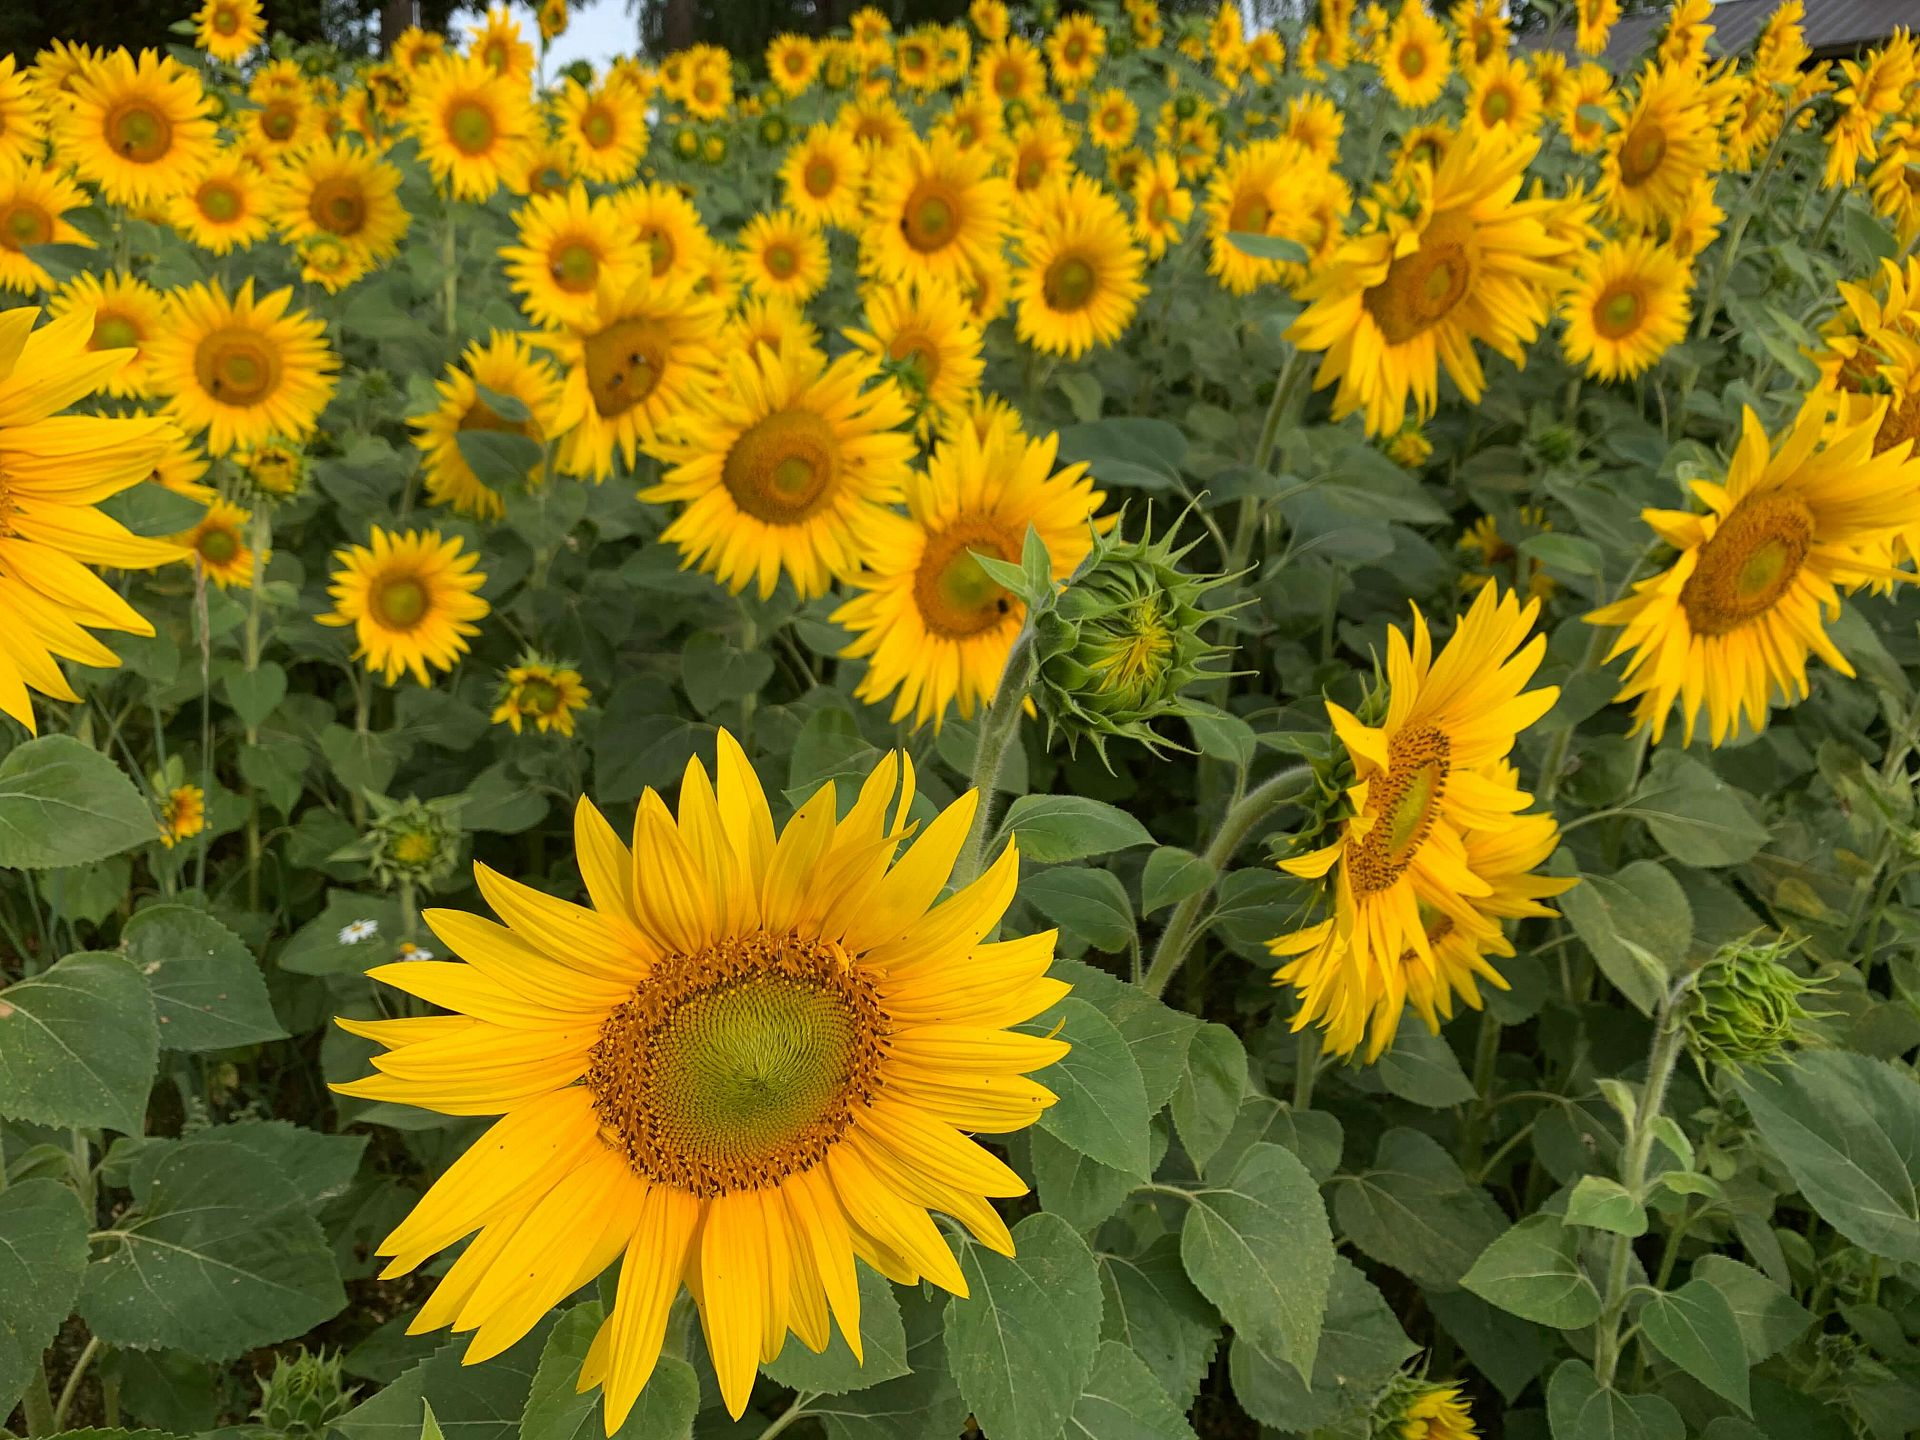 auringonkukat kukkii